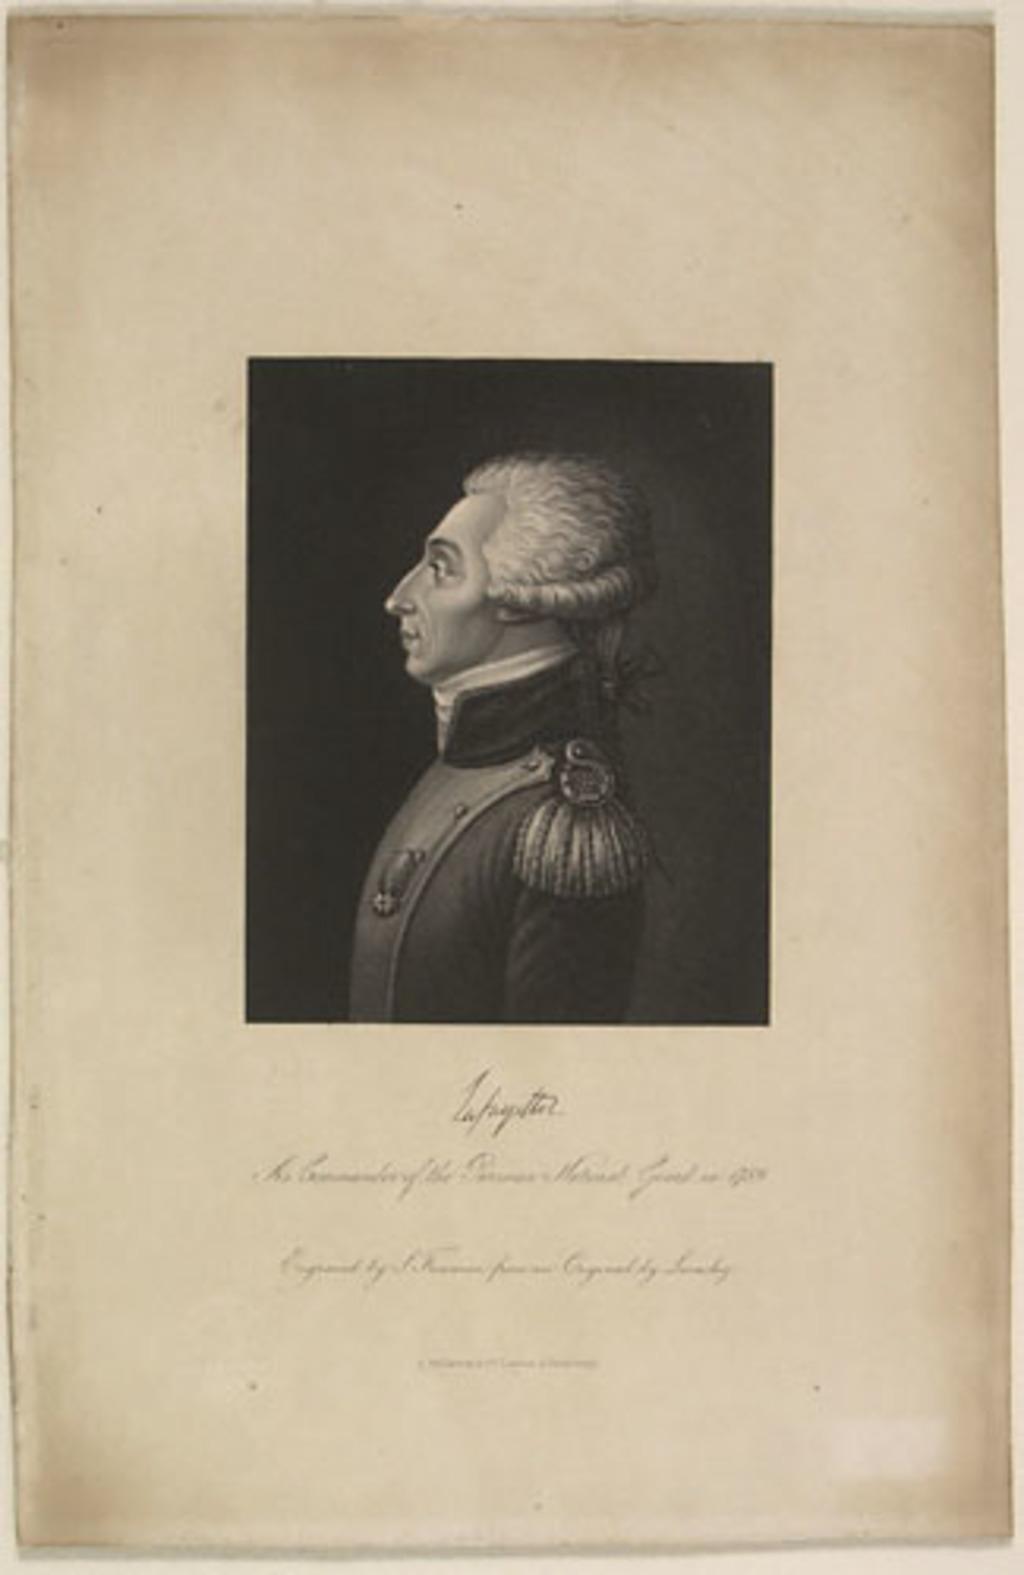 La Fayette en commandant de la Garde nationale parisienne en 1789